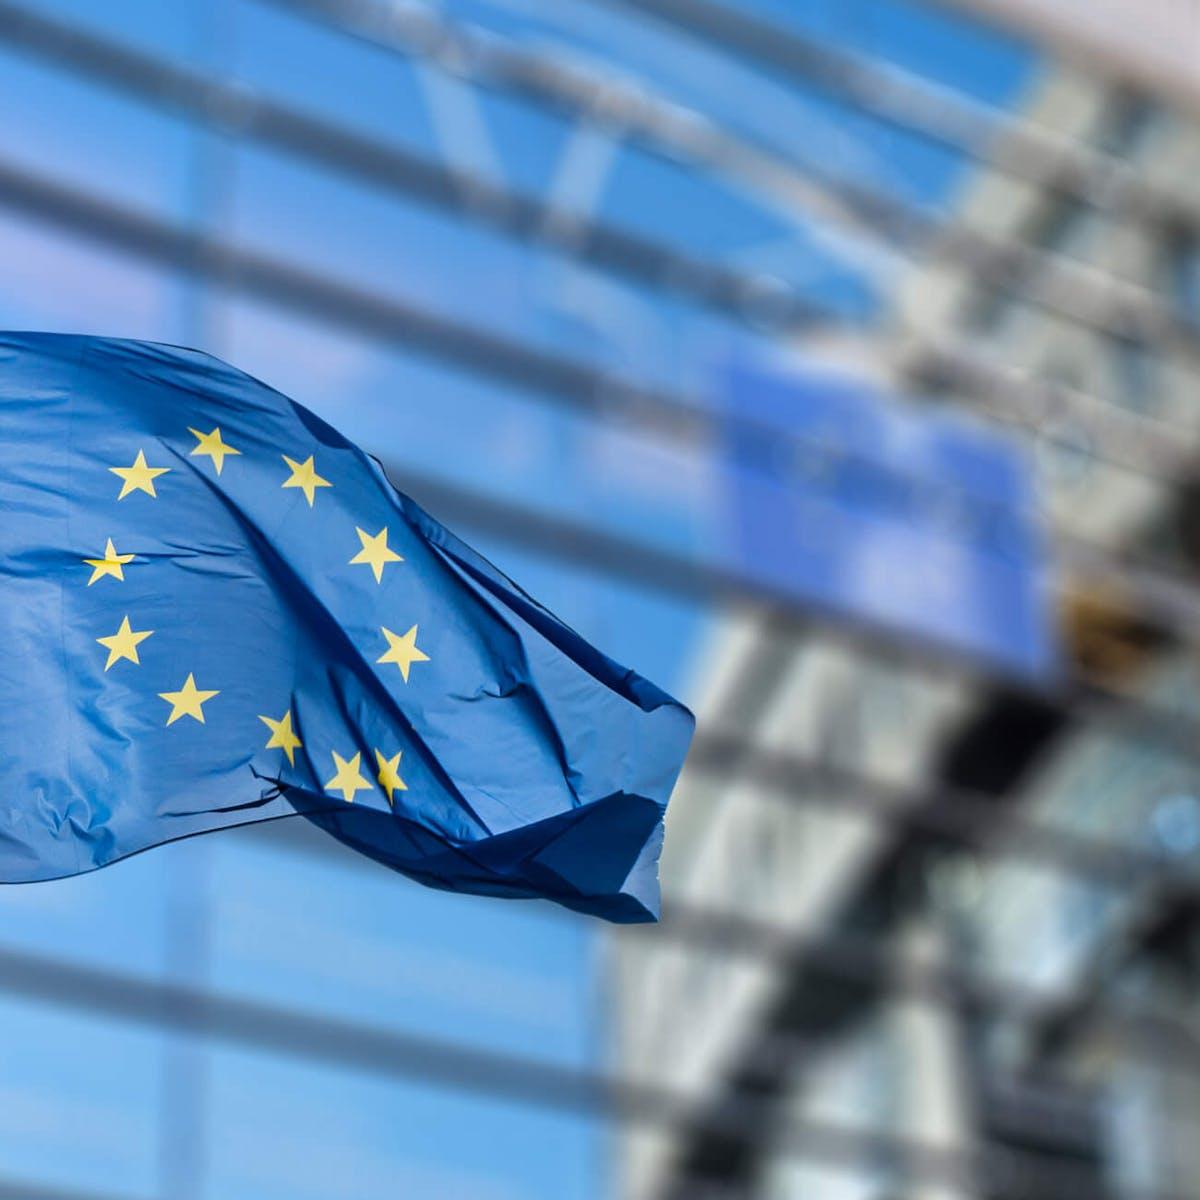 Titelbild-Europa-Flagge-Fahne-iStock-506815322-artJazz